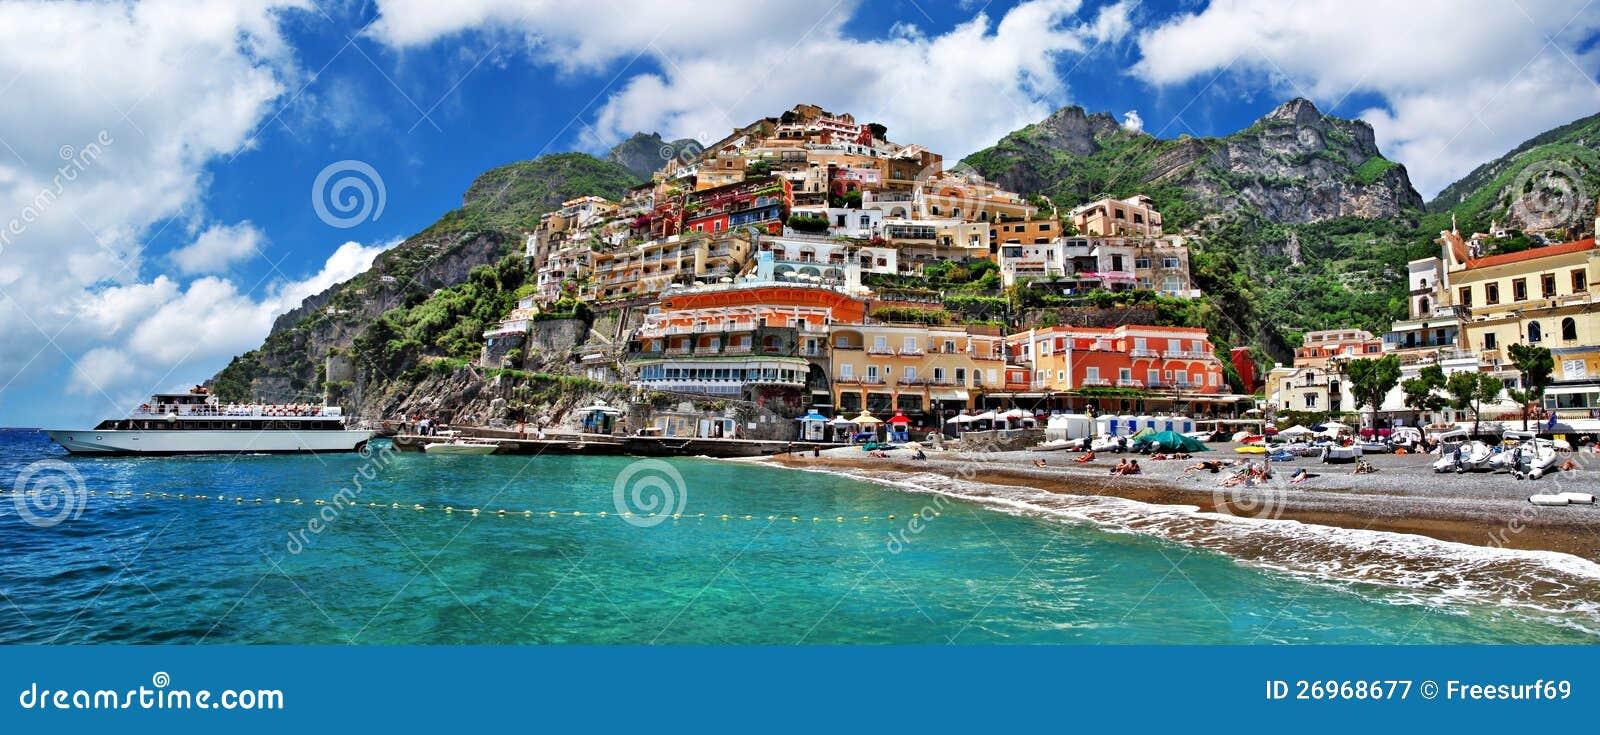 Italy litoral - Positano